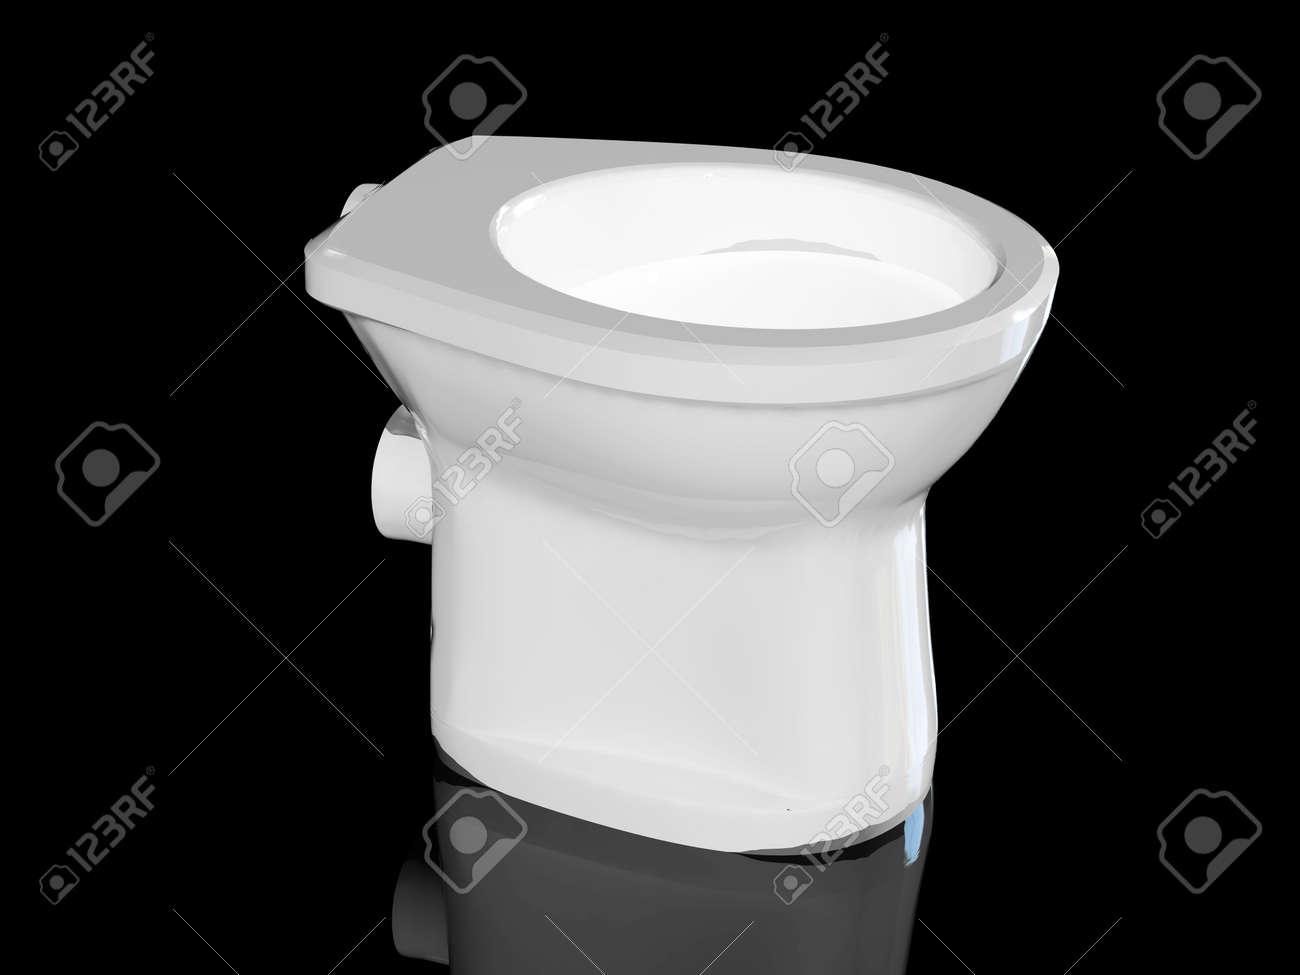 High resolution image white toilet bowl. 3d illustration over  black backgrounds. Stock Illustration - 2626073